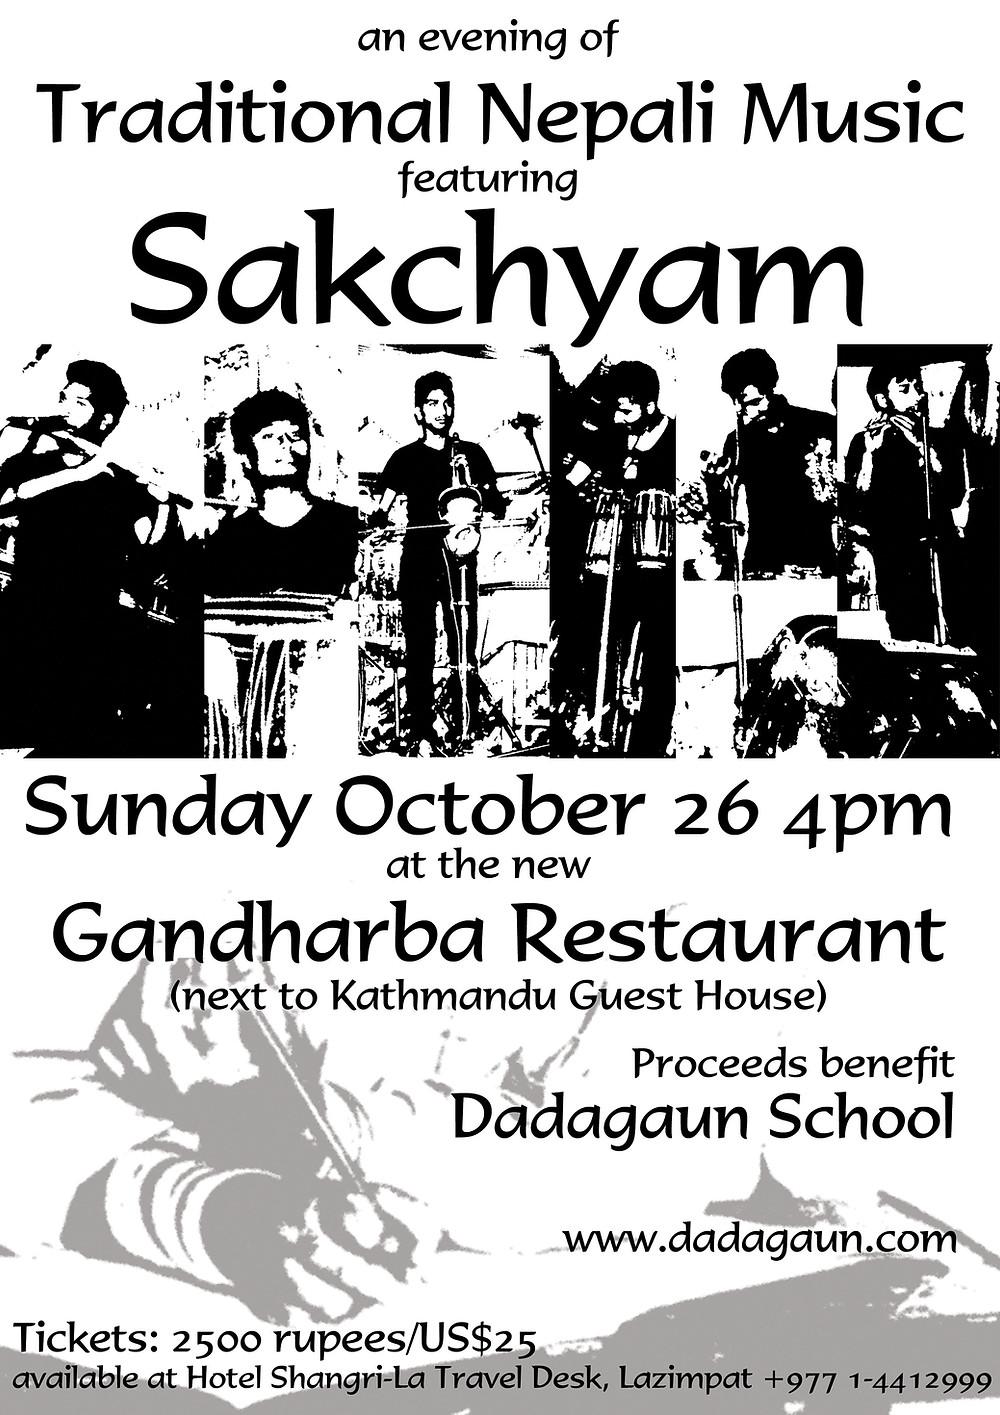 DadadaGaun-Fundraiser-Poster